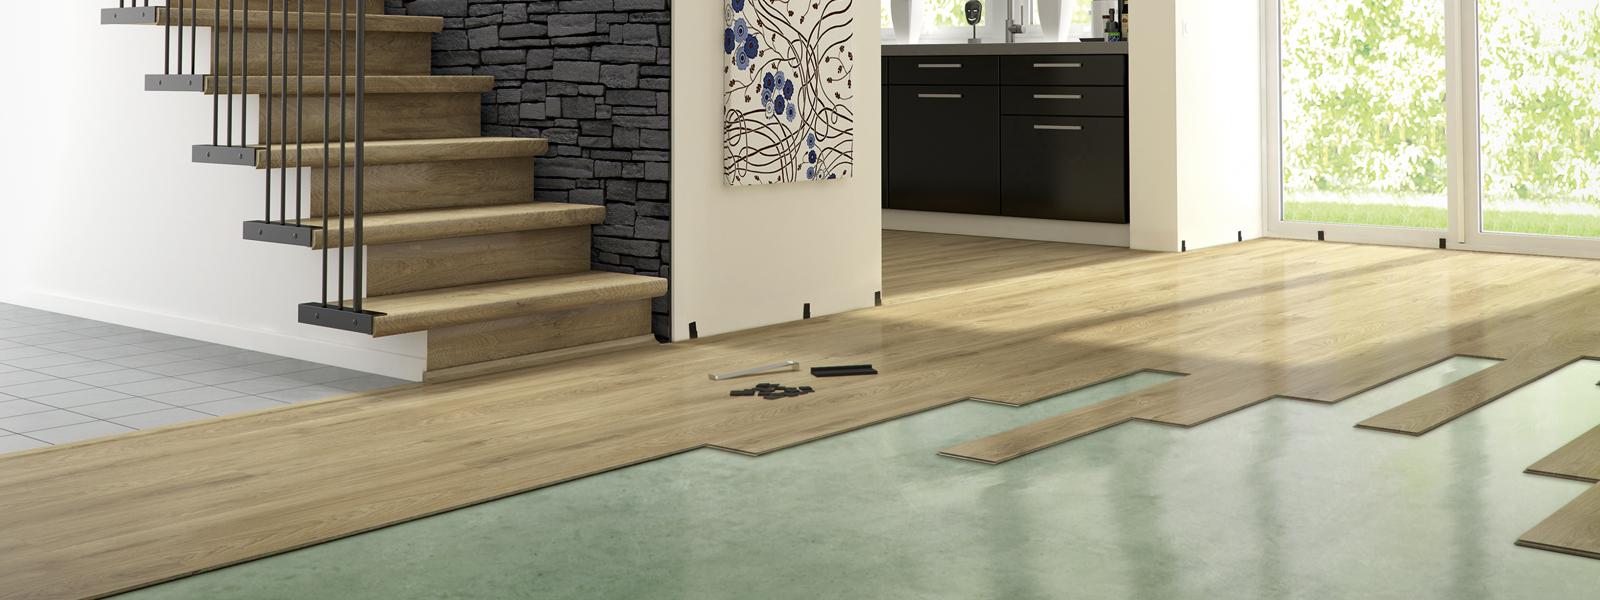 rustikales parkett verleiht ihrem fussboden charakter. Black Bedroom Furniture Sets. Home Design Ideas